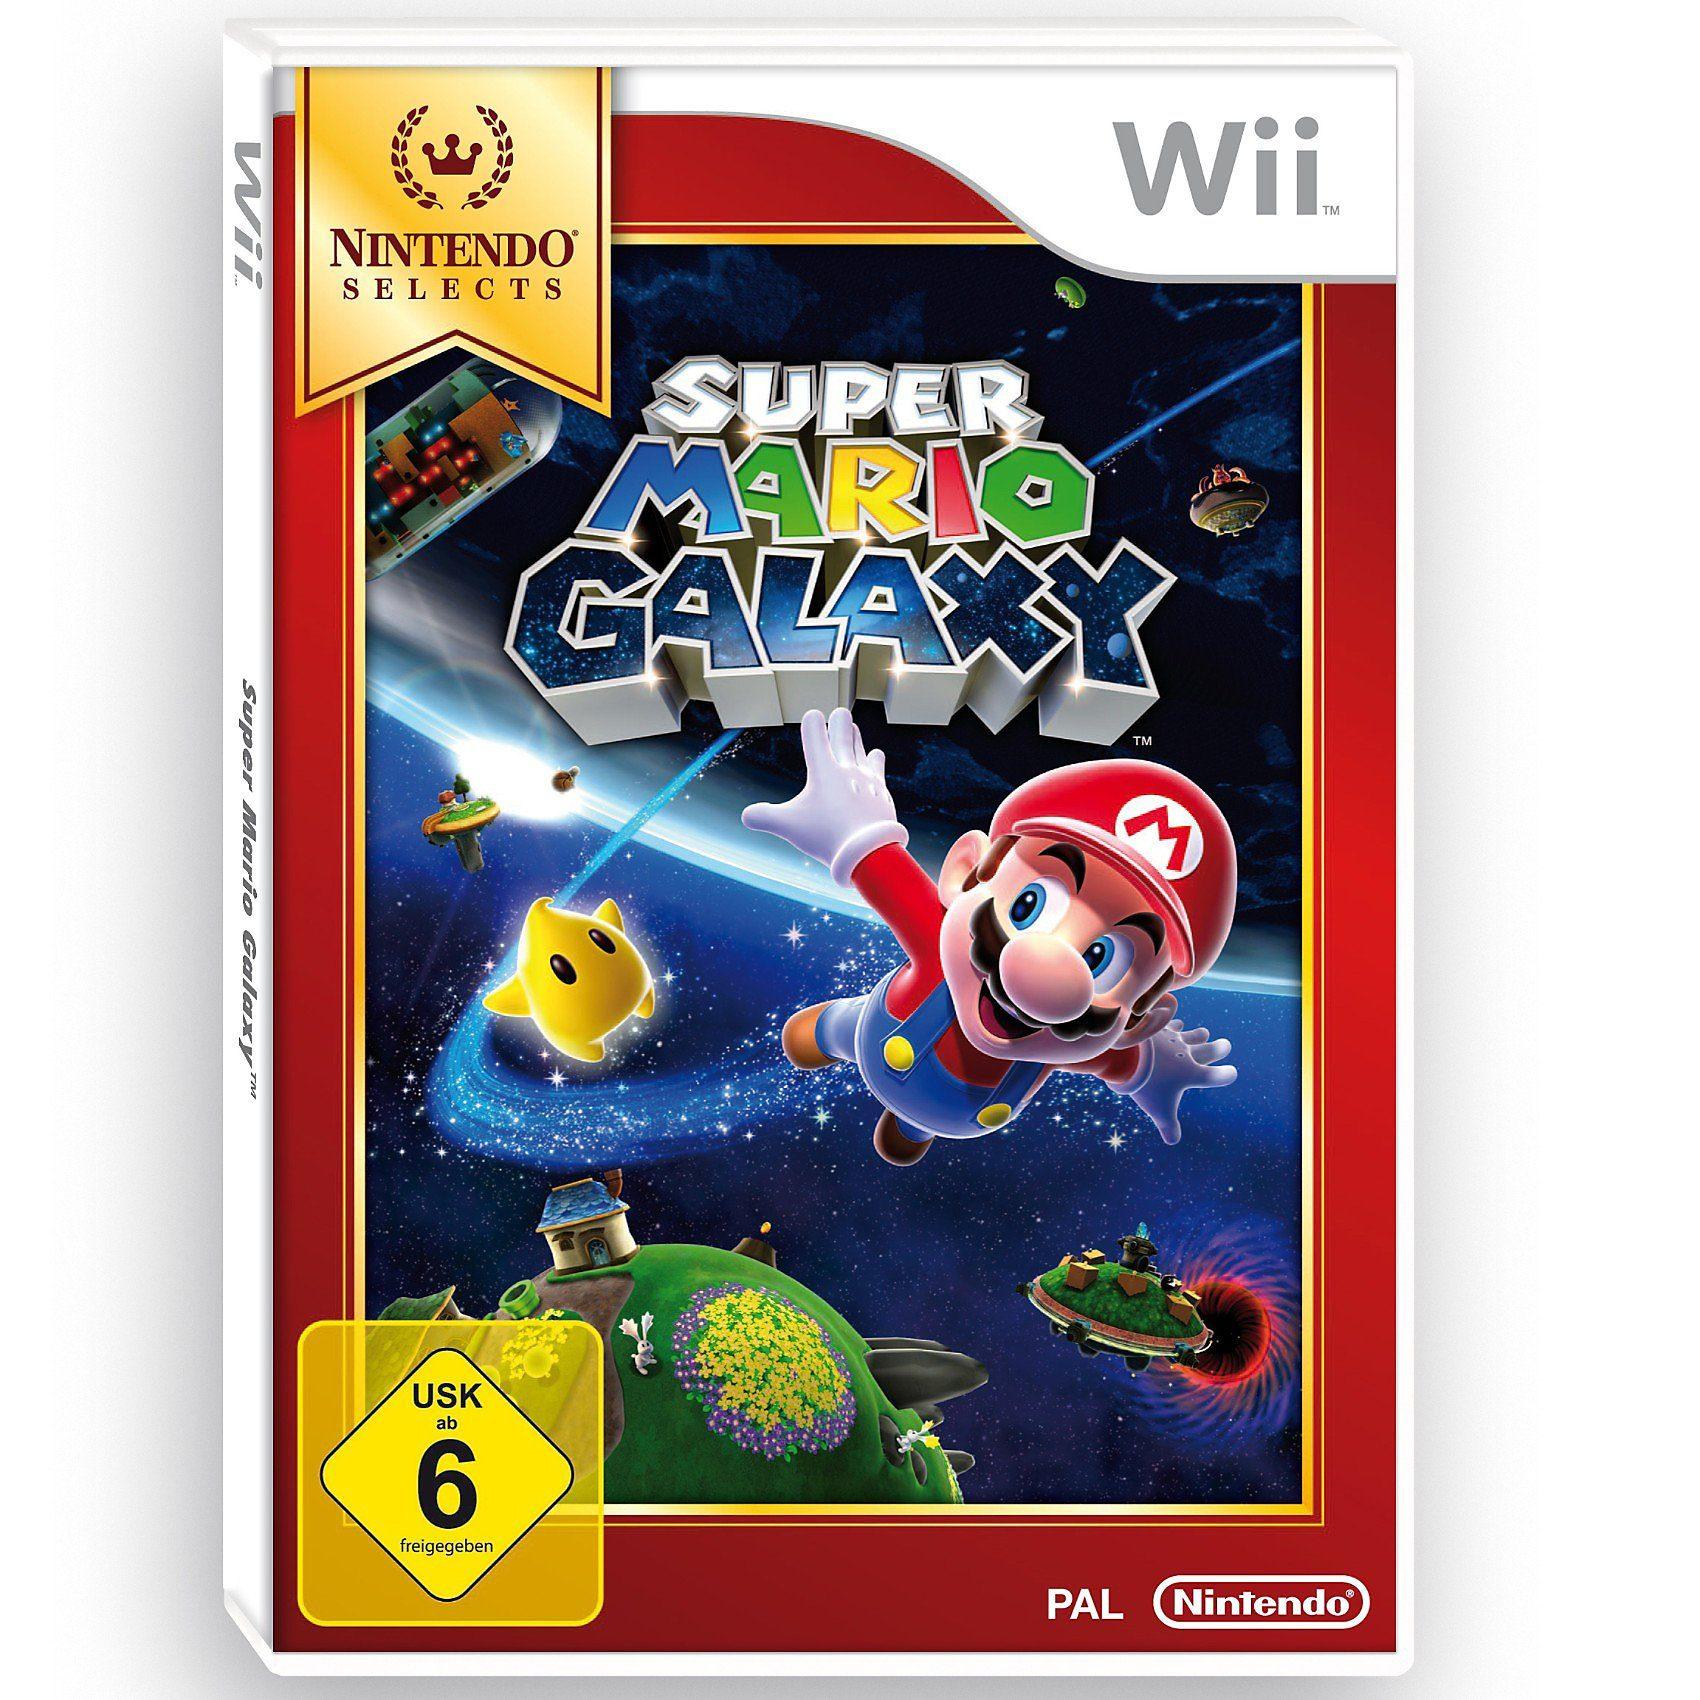 Nintendo Wii Super Mario Galaxy - Selects